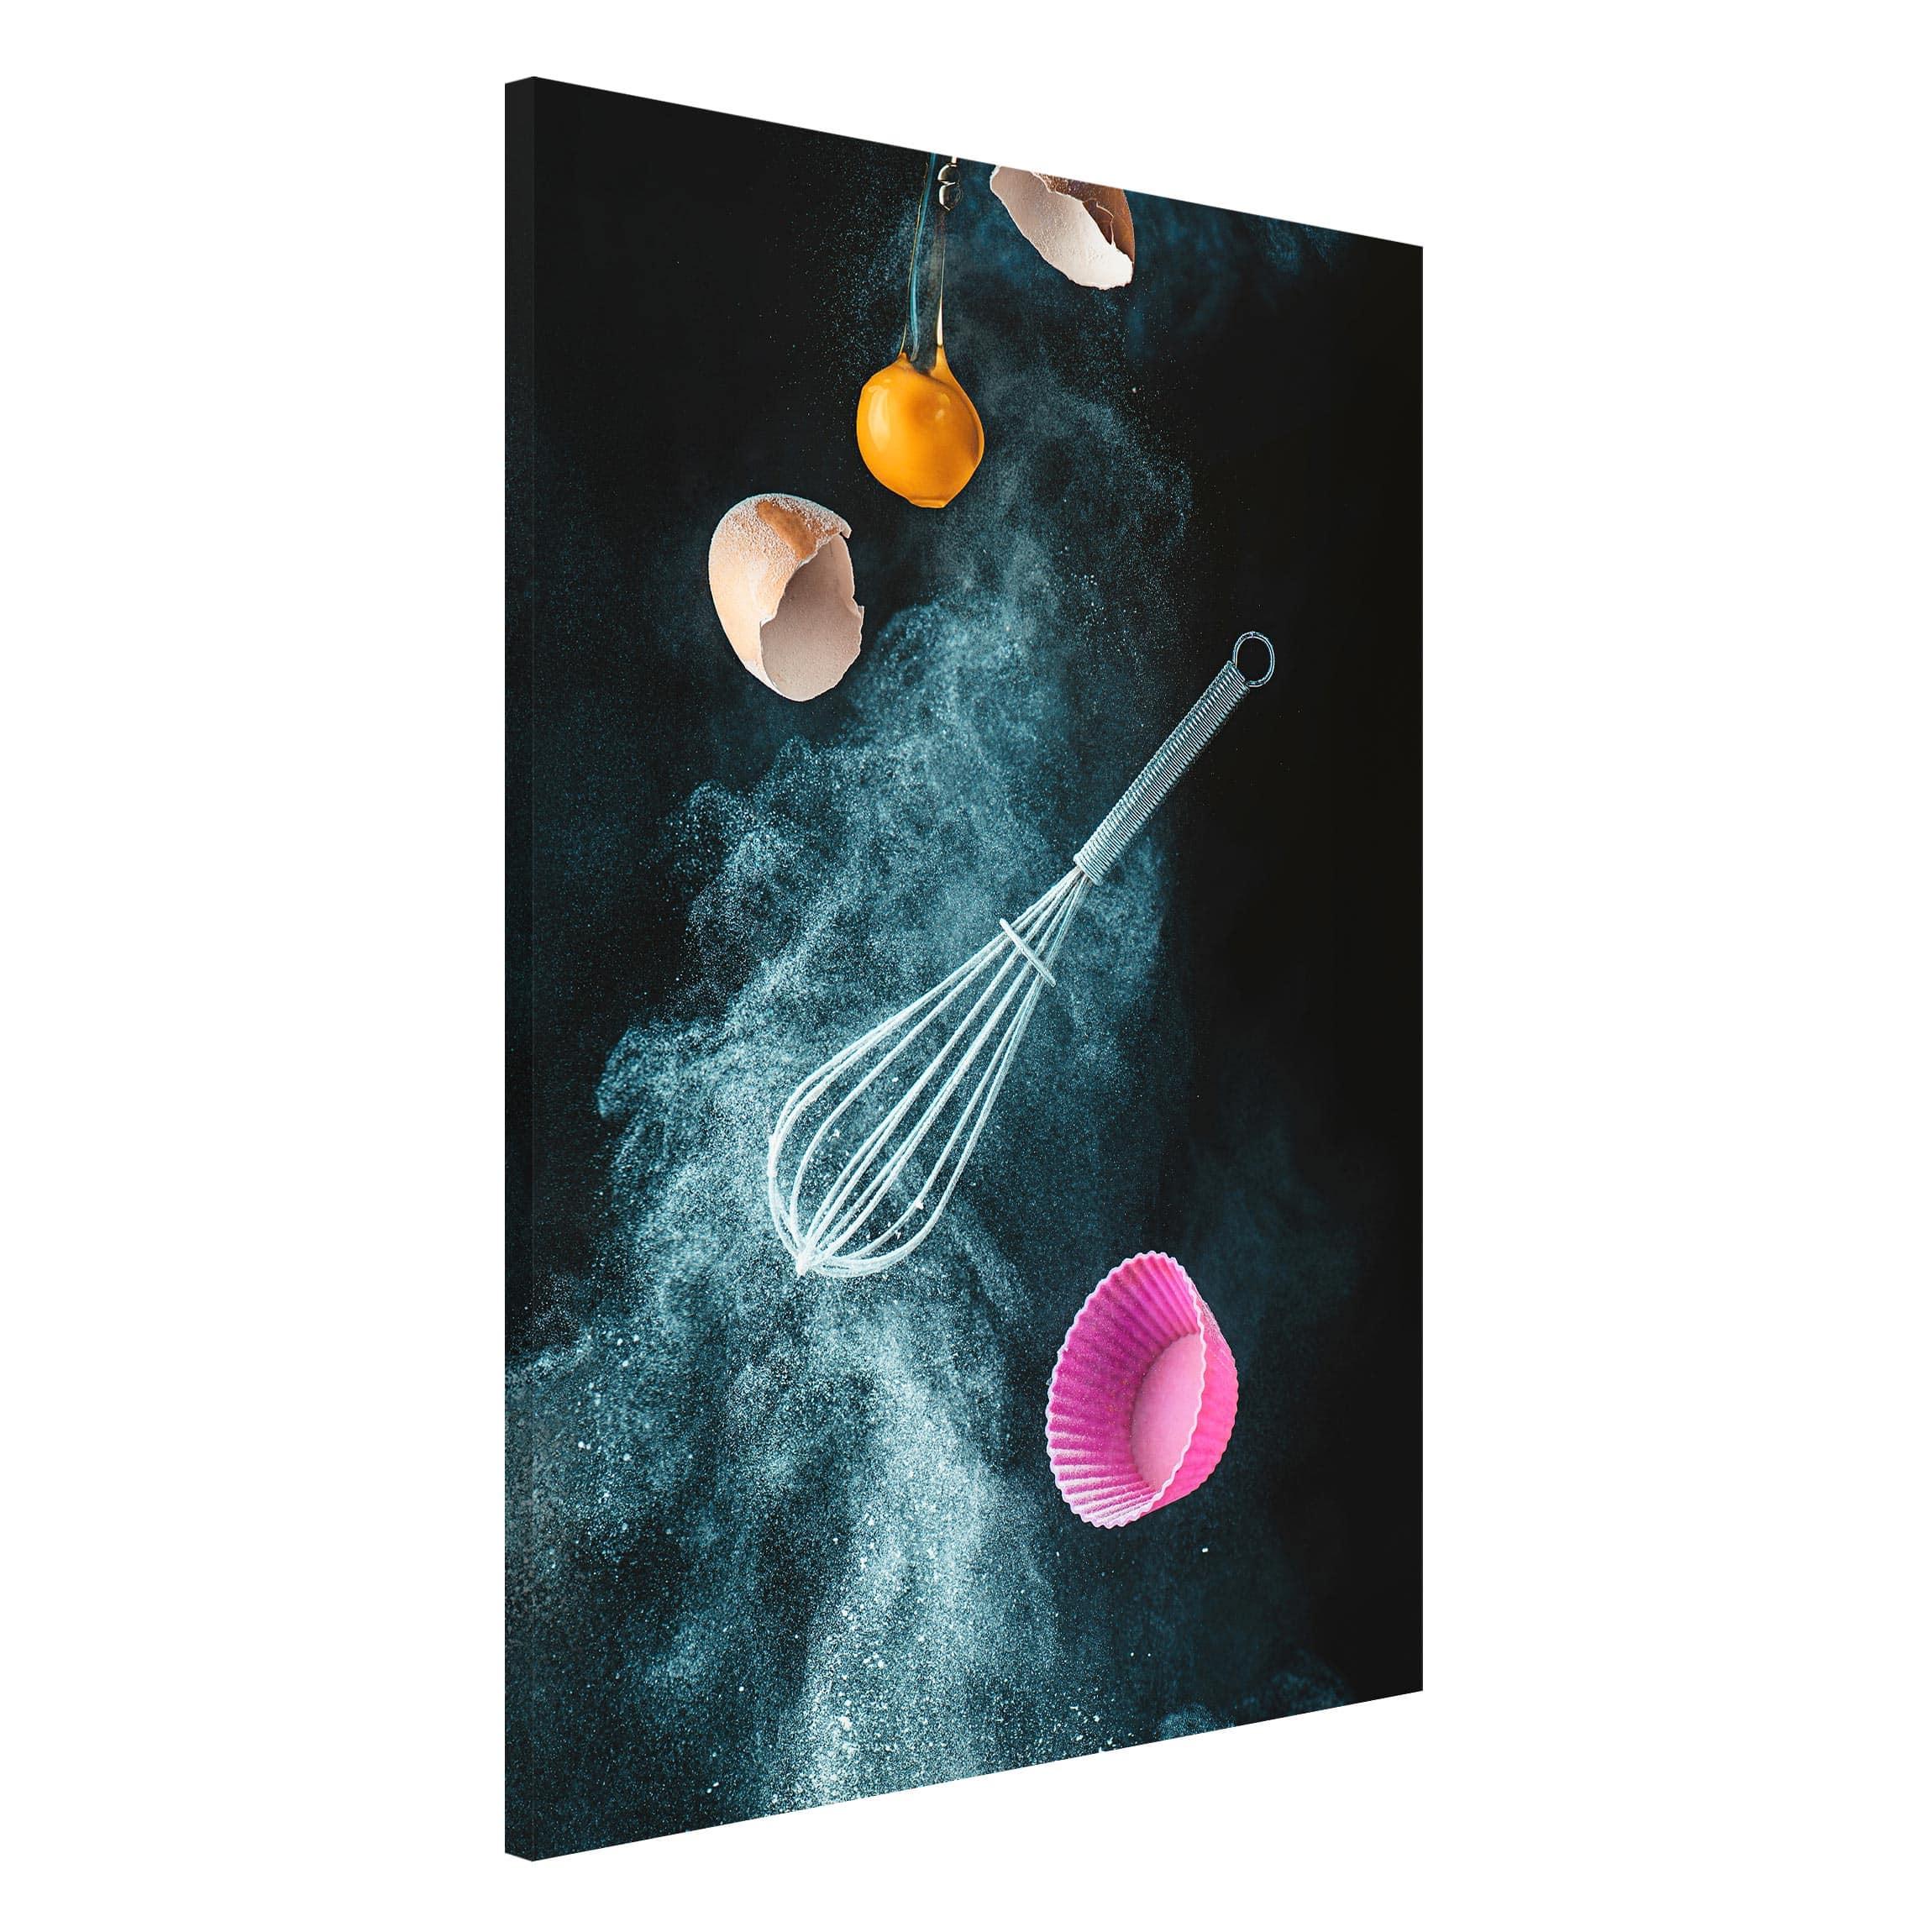 Full Size of Magnettafel Küche Selbstklebend Beschreibbare Magnettafel Küche Pinnwand Magnettafel Küche Glas Magnettafel Küche Küche Magnettafel Küche